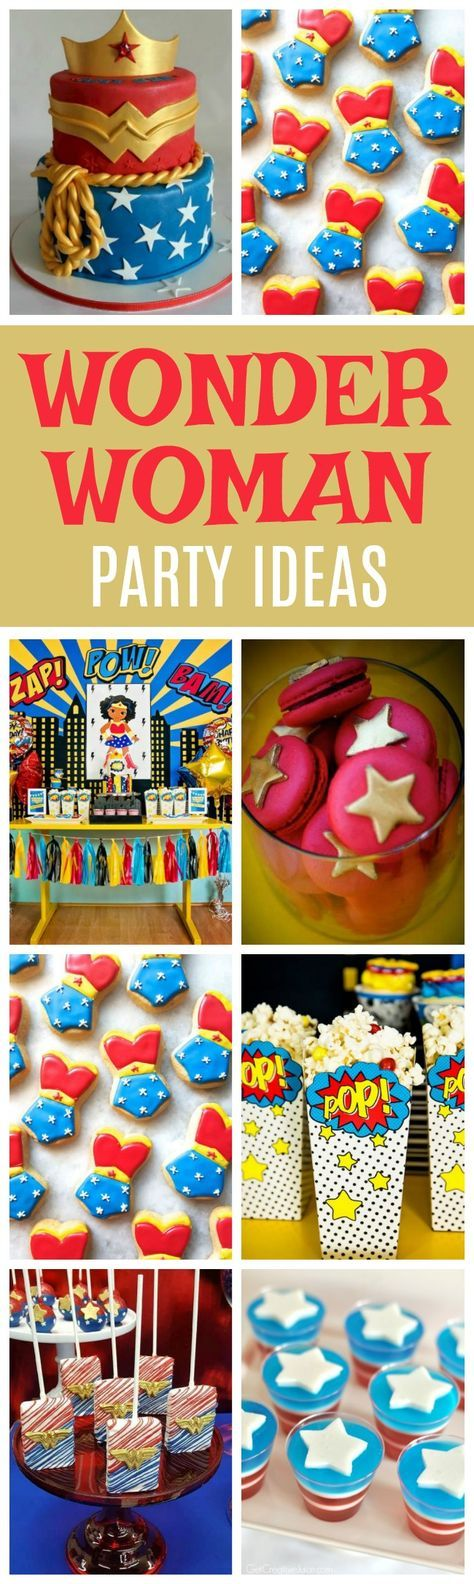 19 Wonder Woman Party Ideas | Pretty My Party